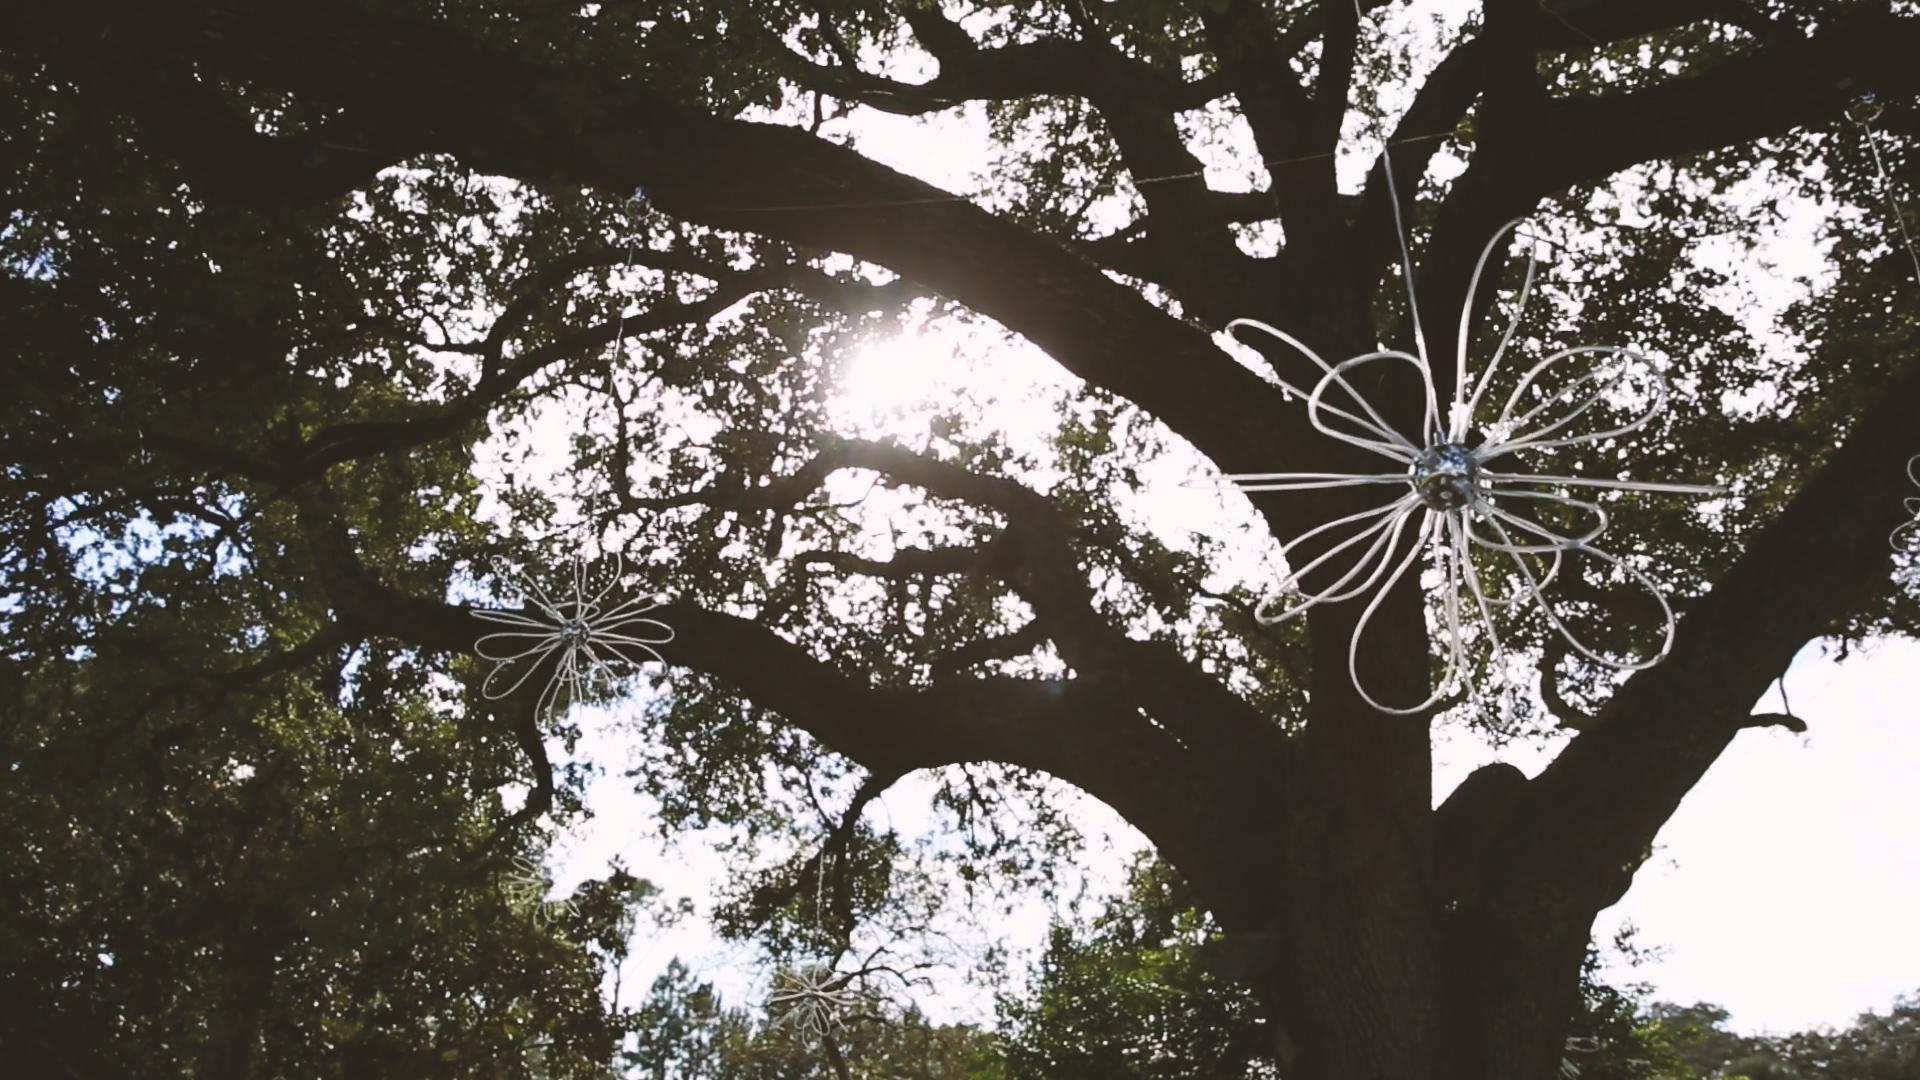 Longue Vue Garden Wedding Videographers New Orleans Tree Decor - Bride Film